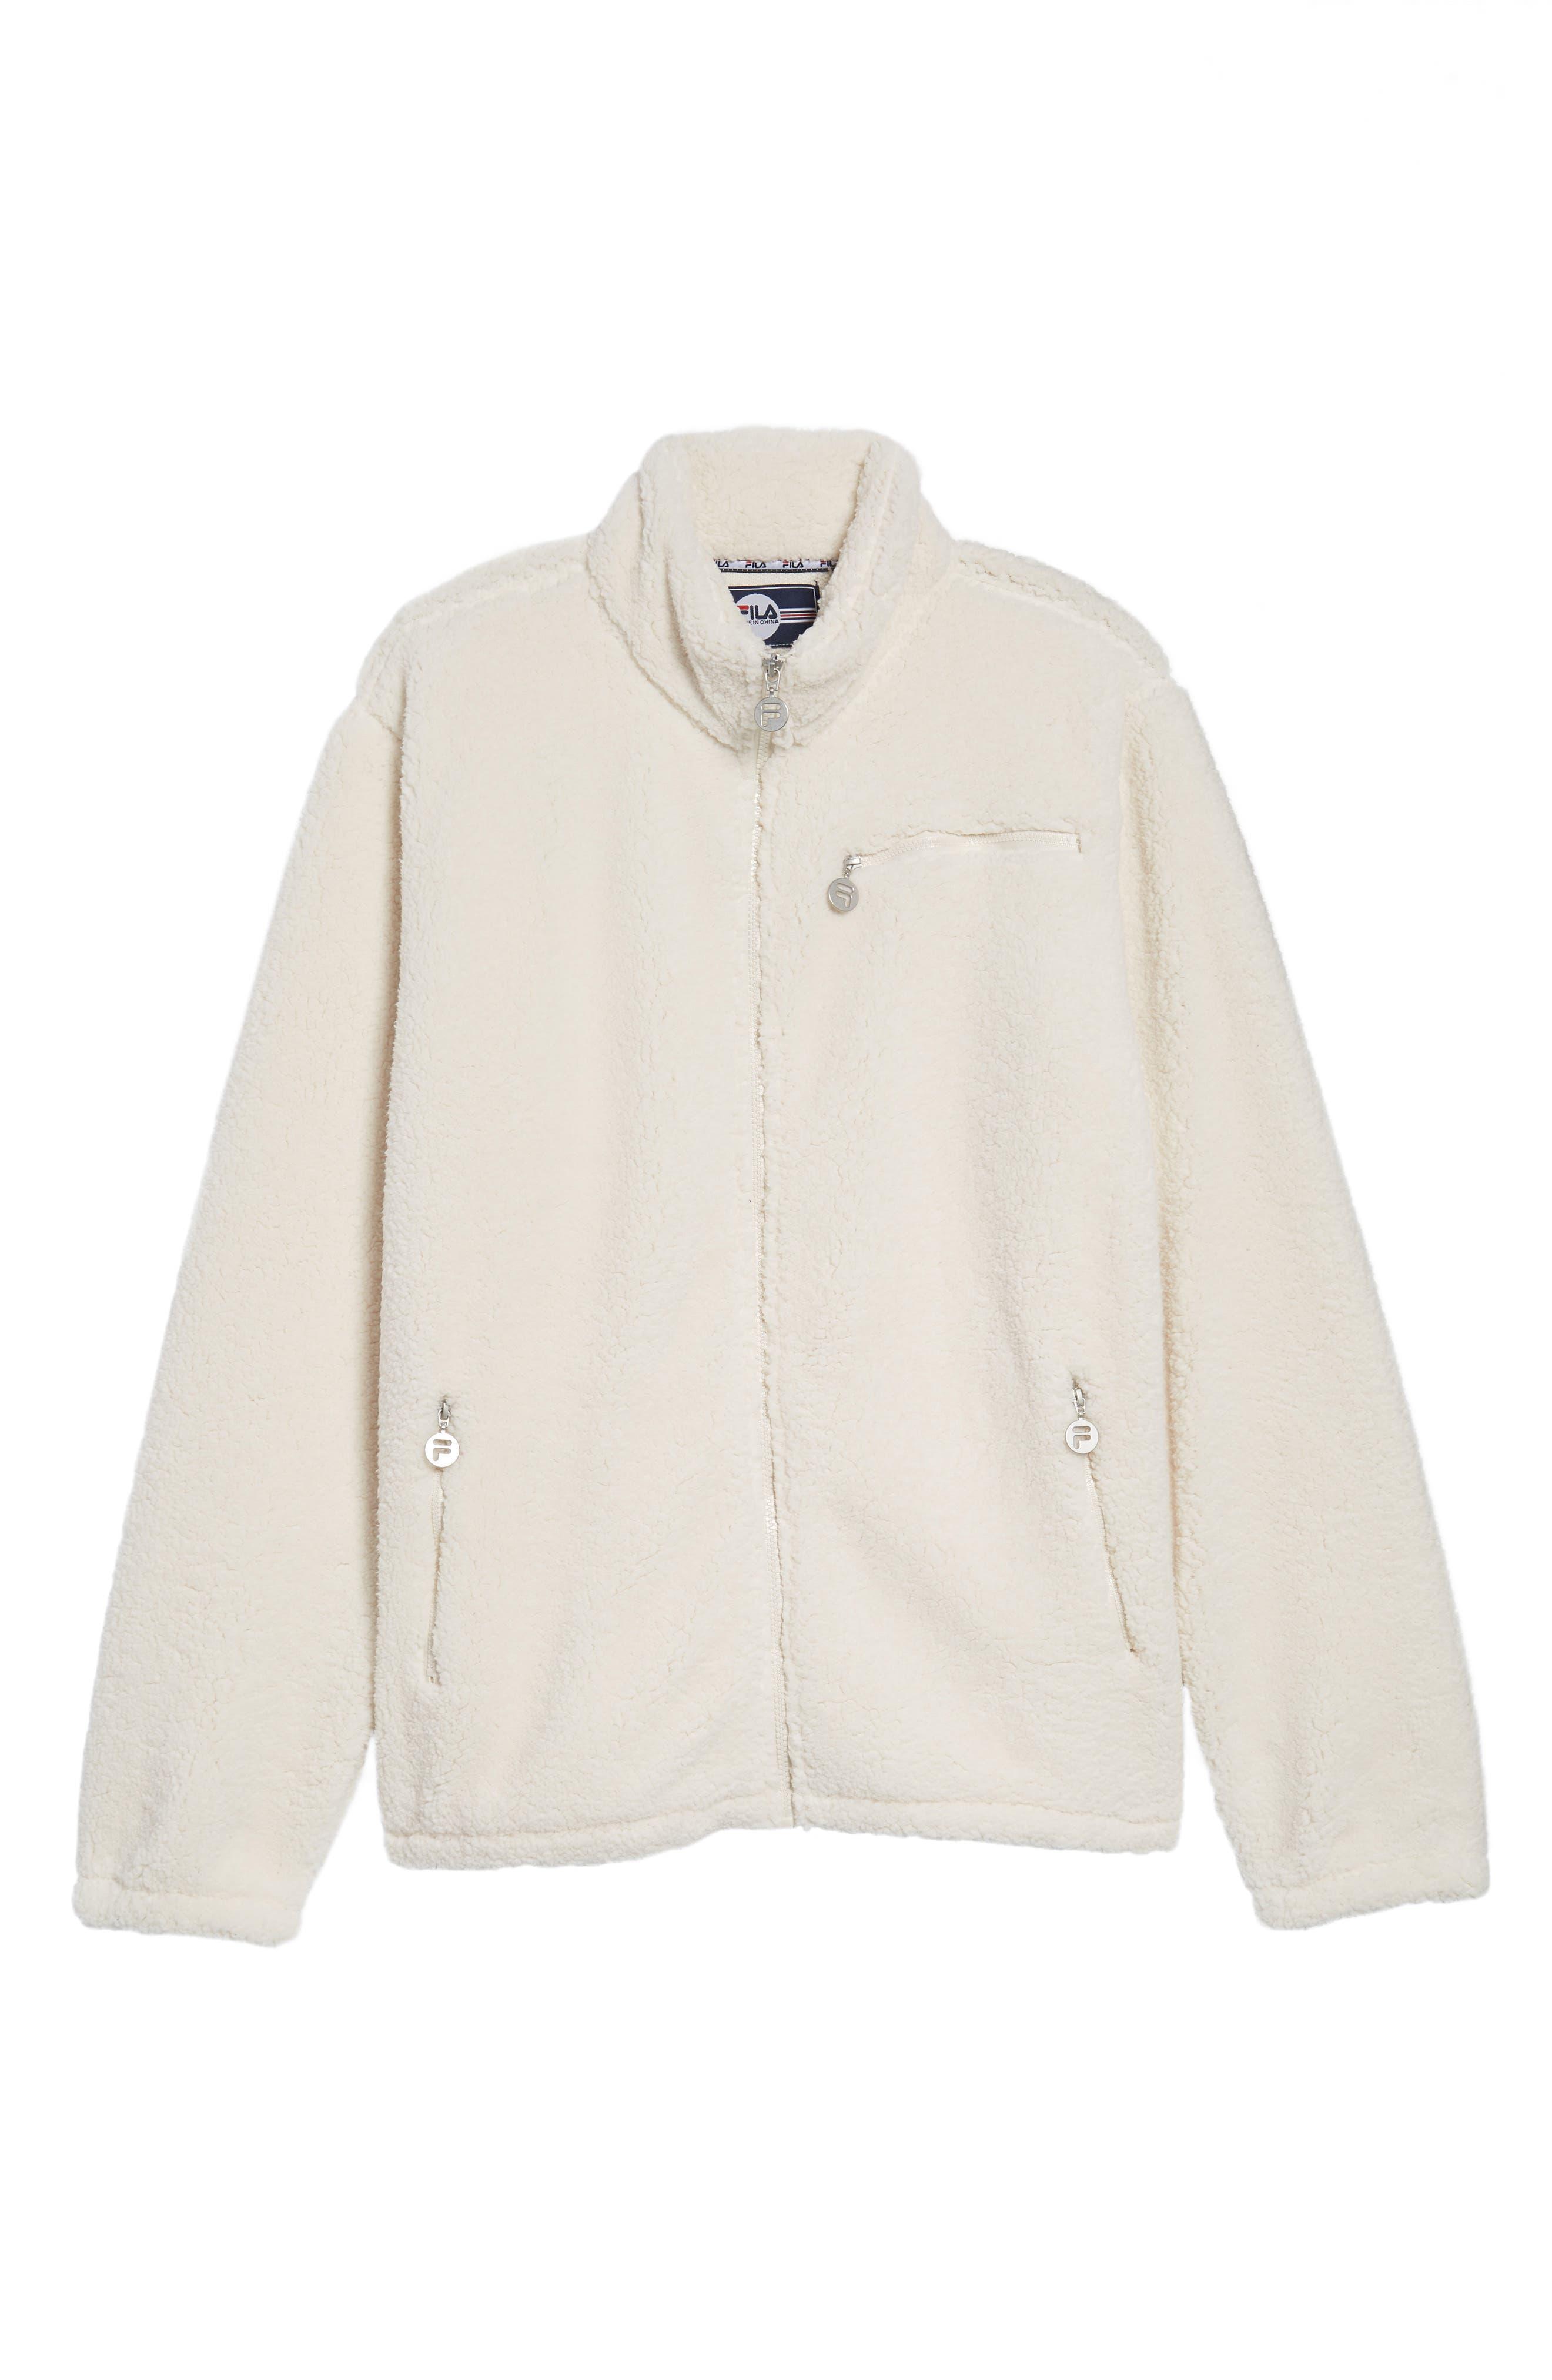 Finlay Fleece Jacket,                             Alternate thumbnail 6, color,                             Gardenia/ Navy/ Chinese Red